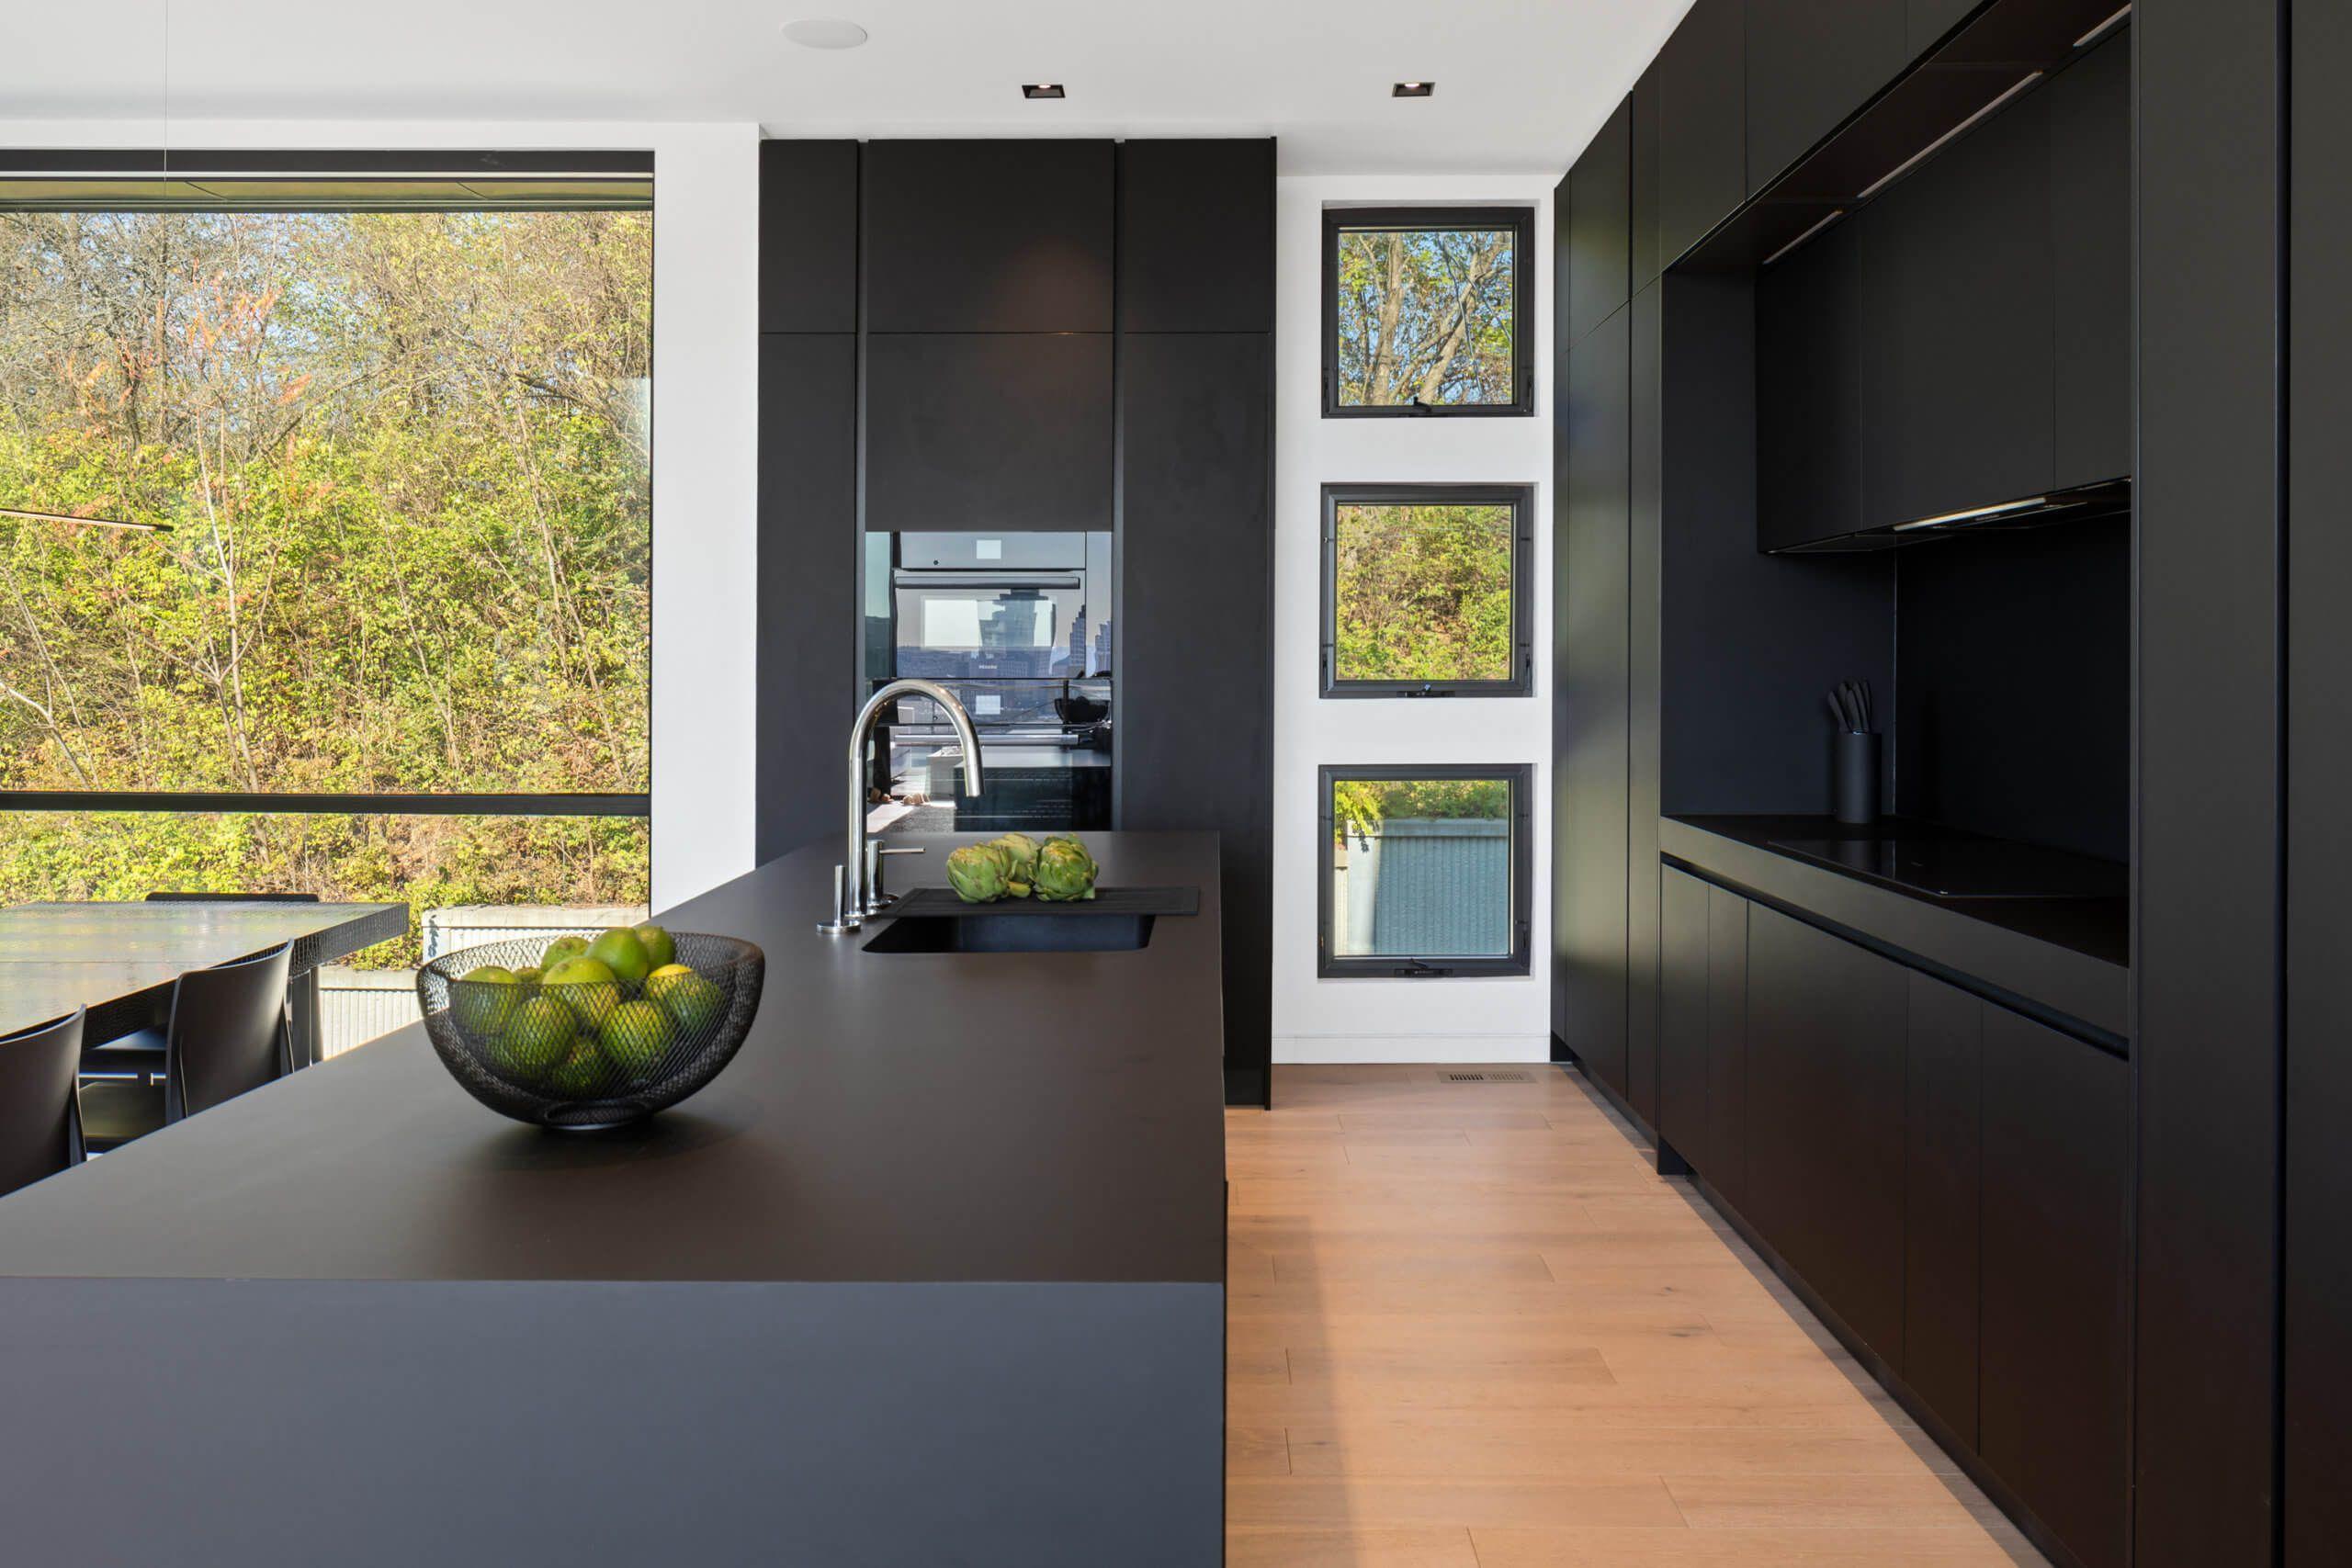 Custom High-End Kitchen by Interior Designer RM Interiors in Cincinnati, Ohio